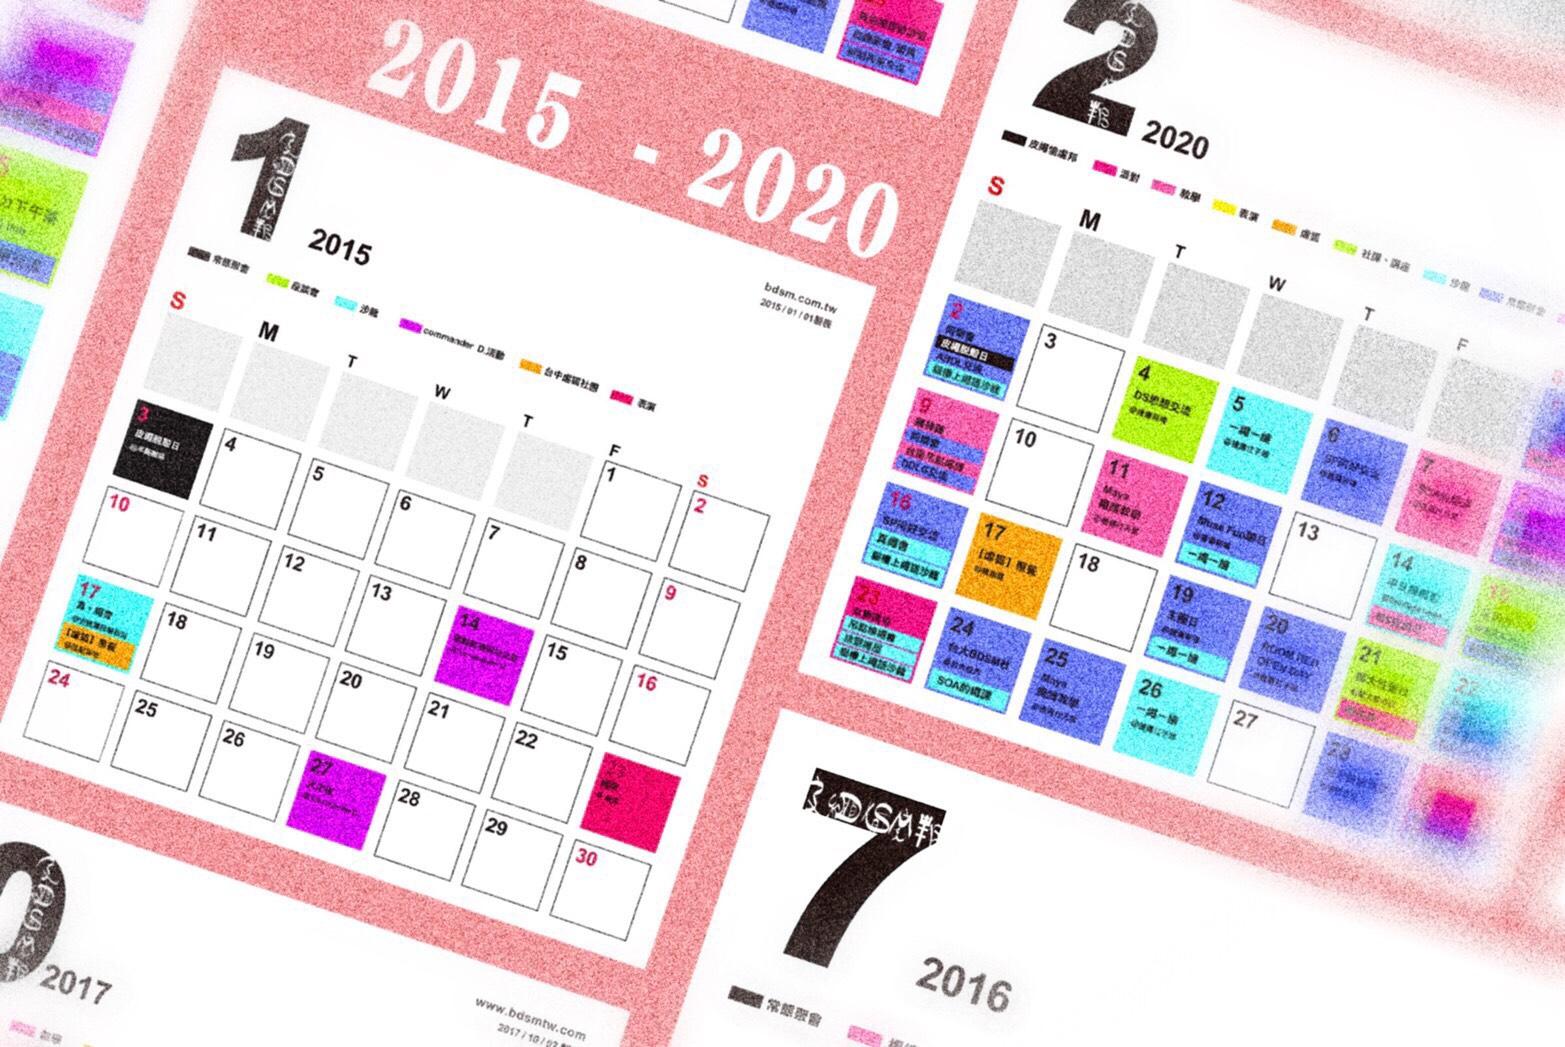 《BDSM康樂玩》DDlg (MDlb)/Abdl交流體驗 - BDSM Calendar | SMER TODAY